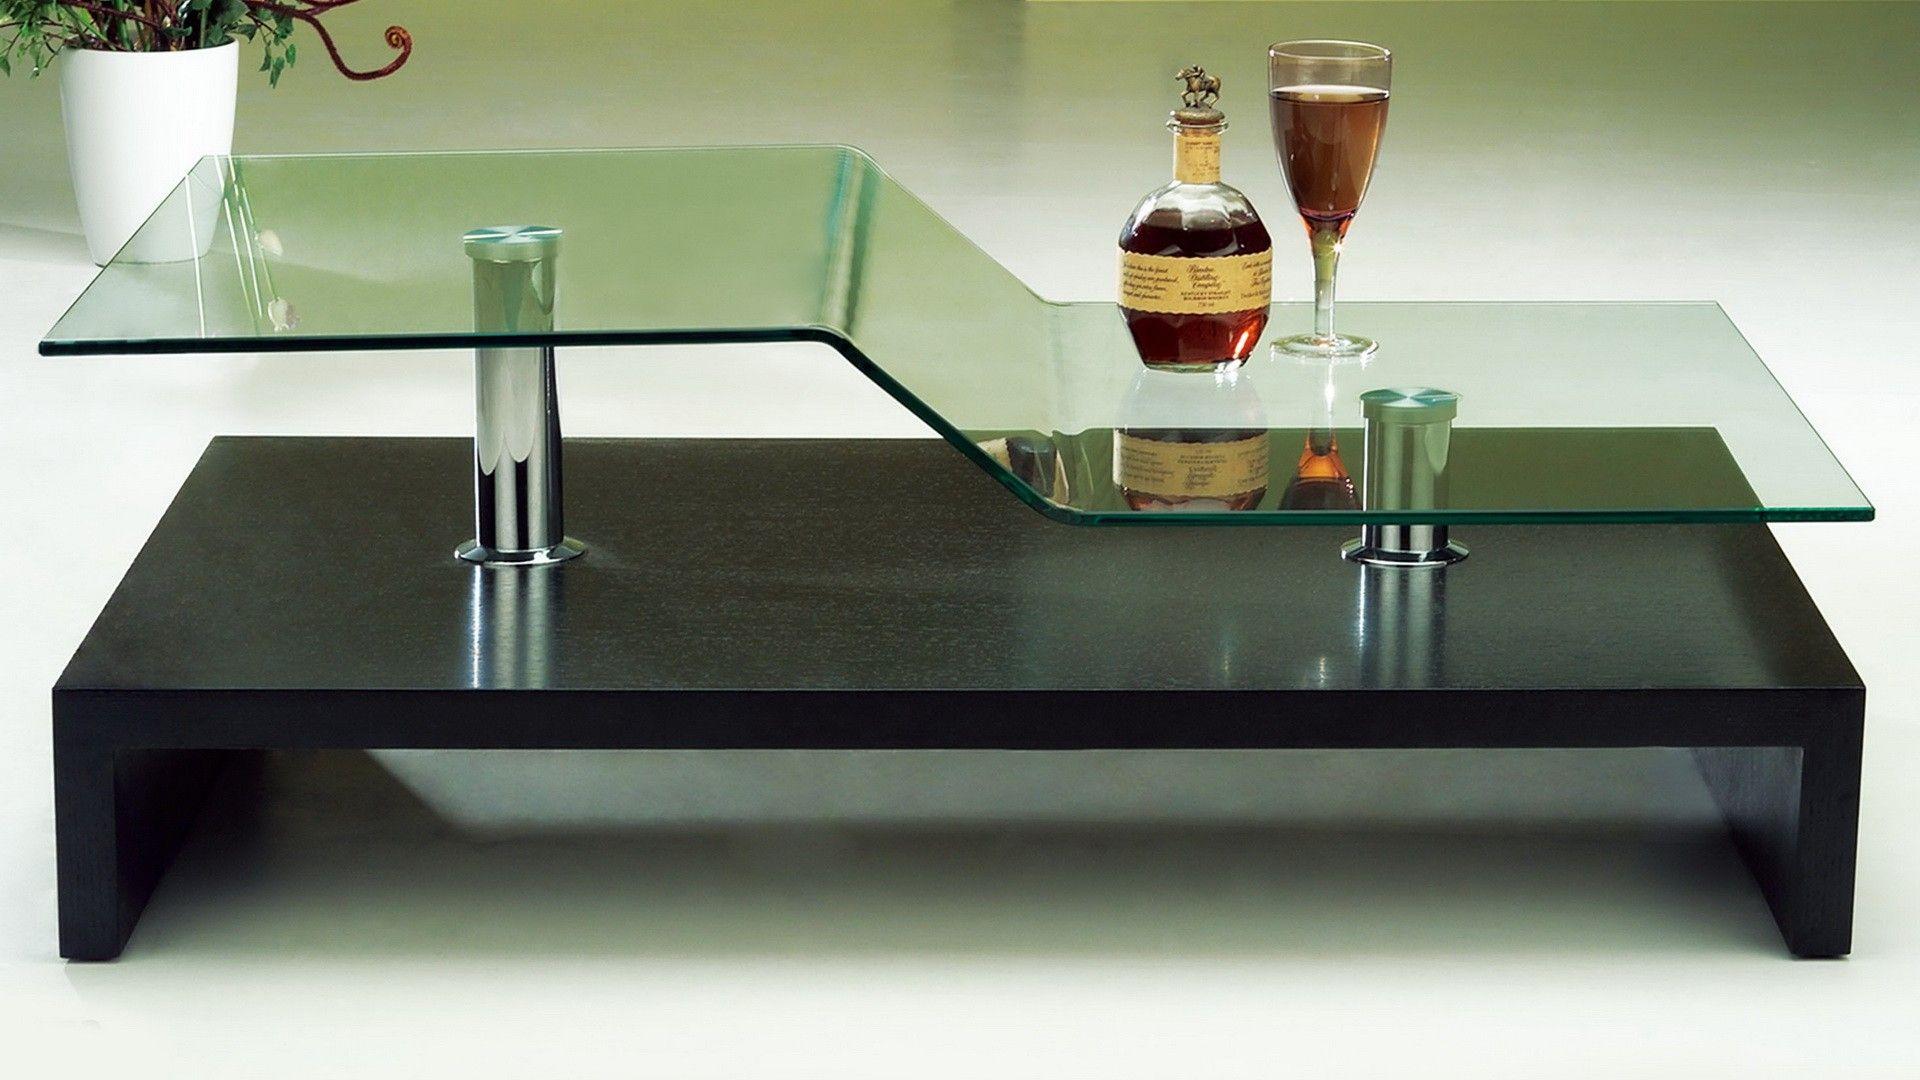 AtHome C5272B Coffee Table Black Rectangular coffee table Glass